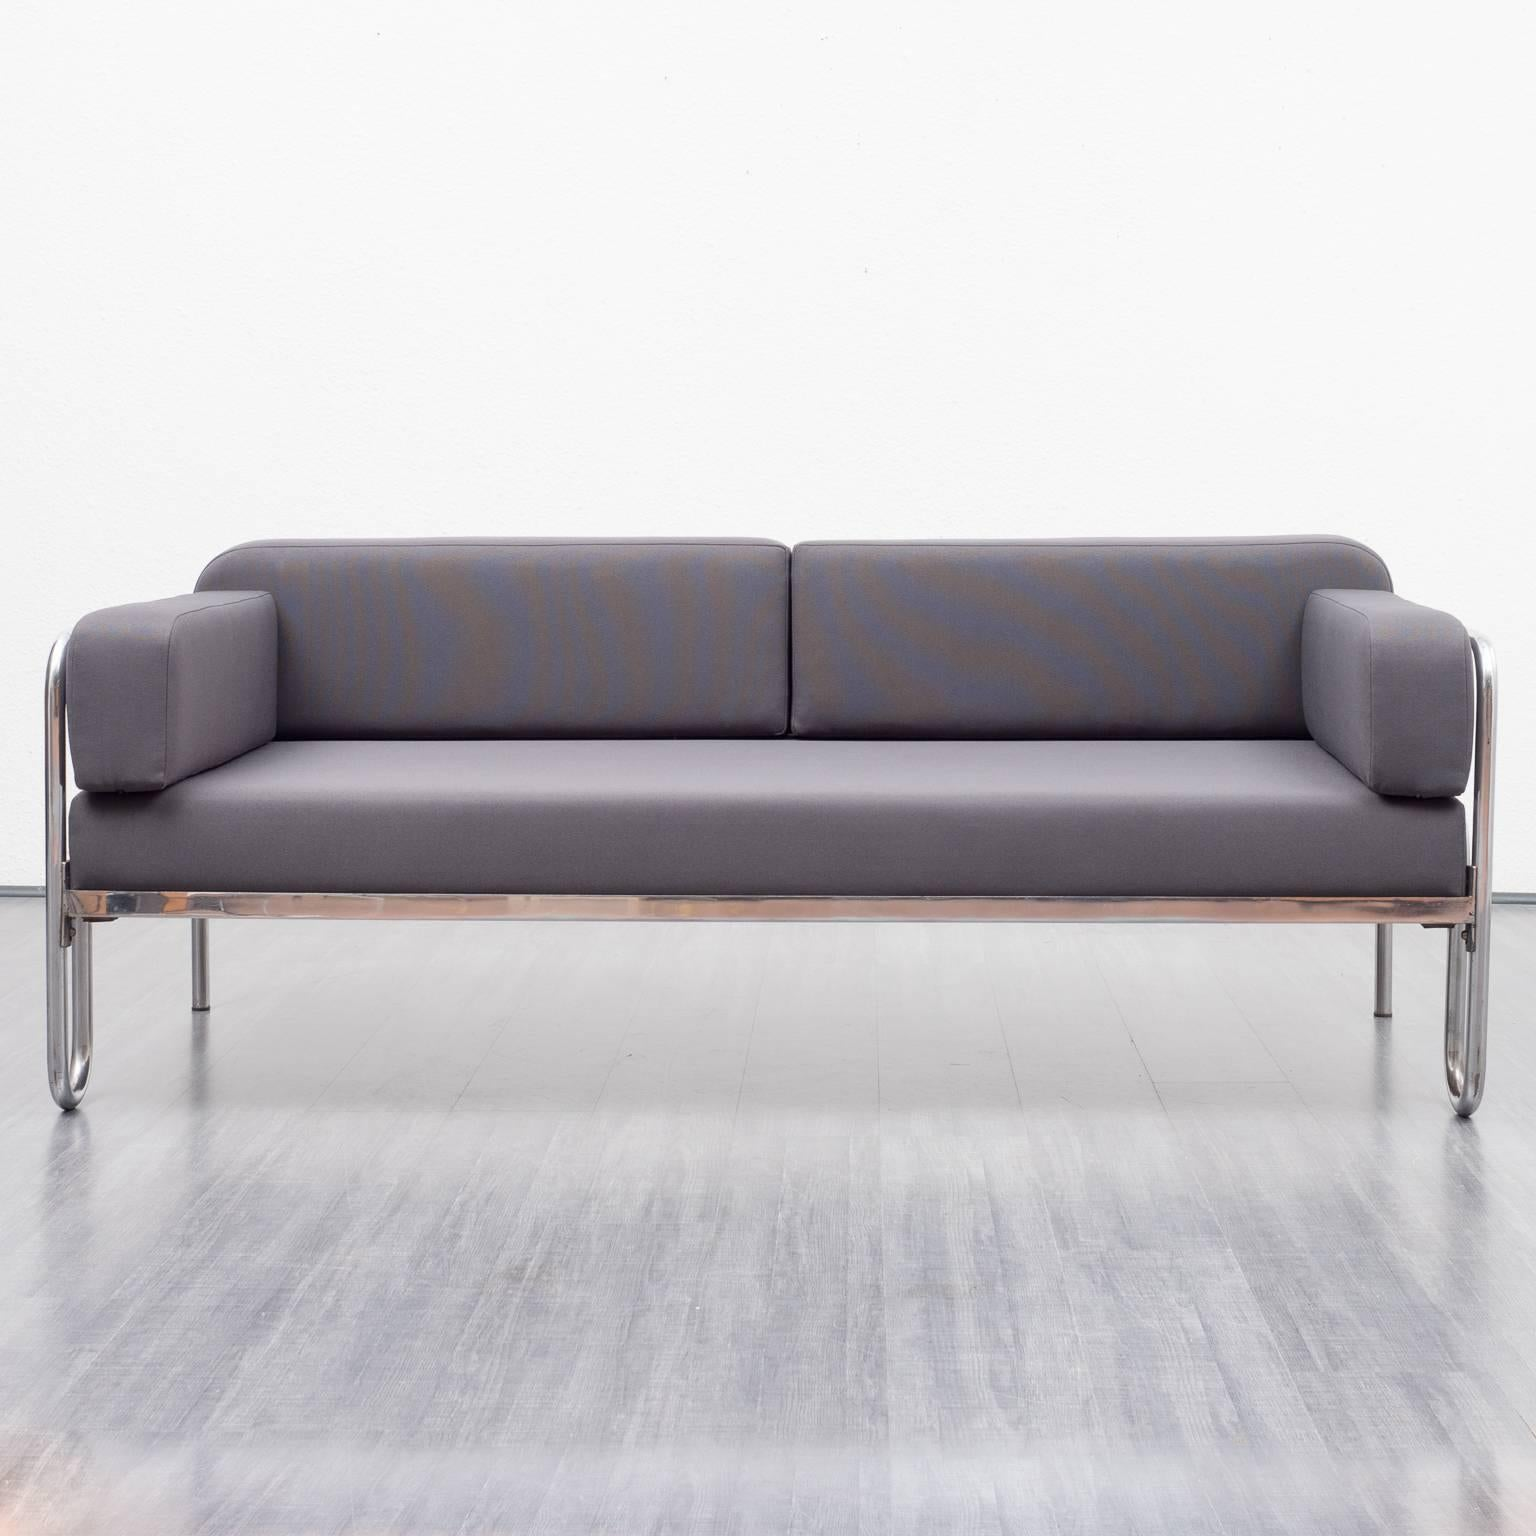 Bauhaus karlsruhe great bauhaus deutschland ettlinger str for Sofa karlsruhe